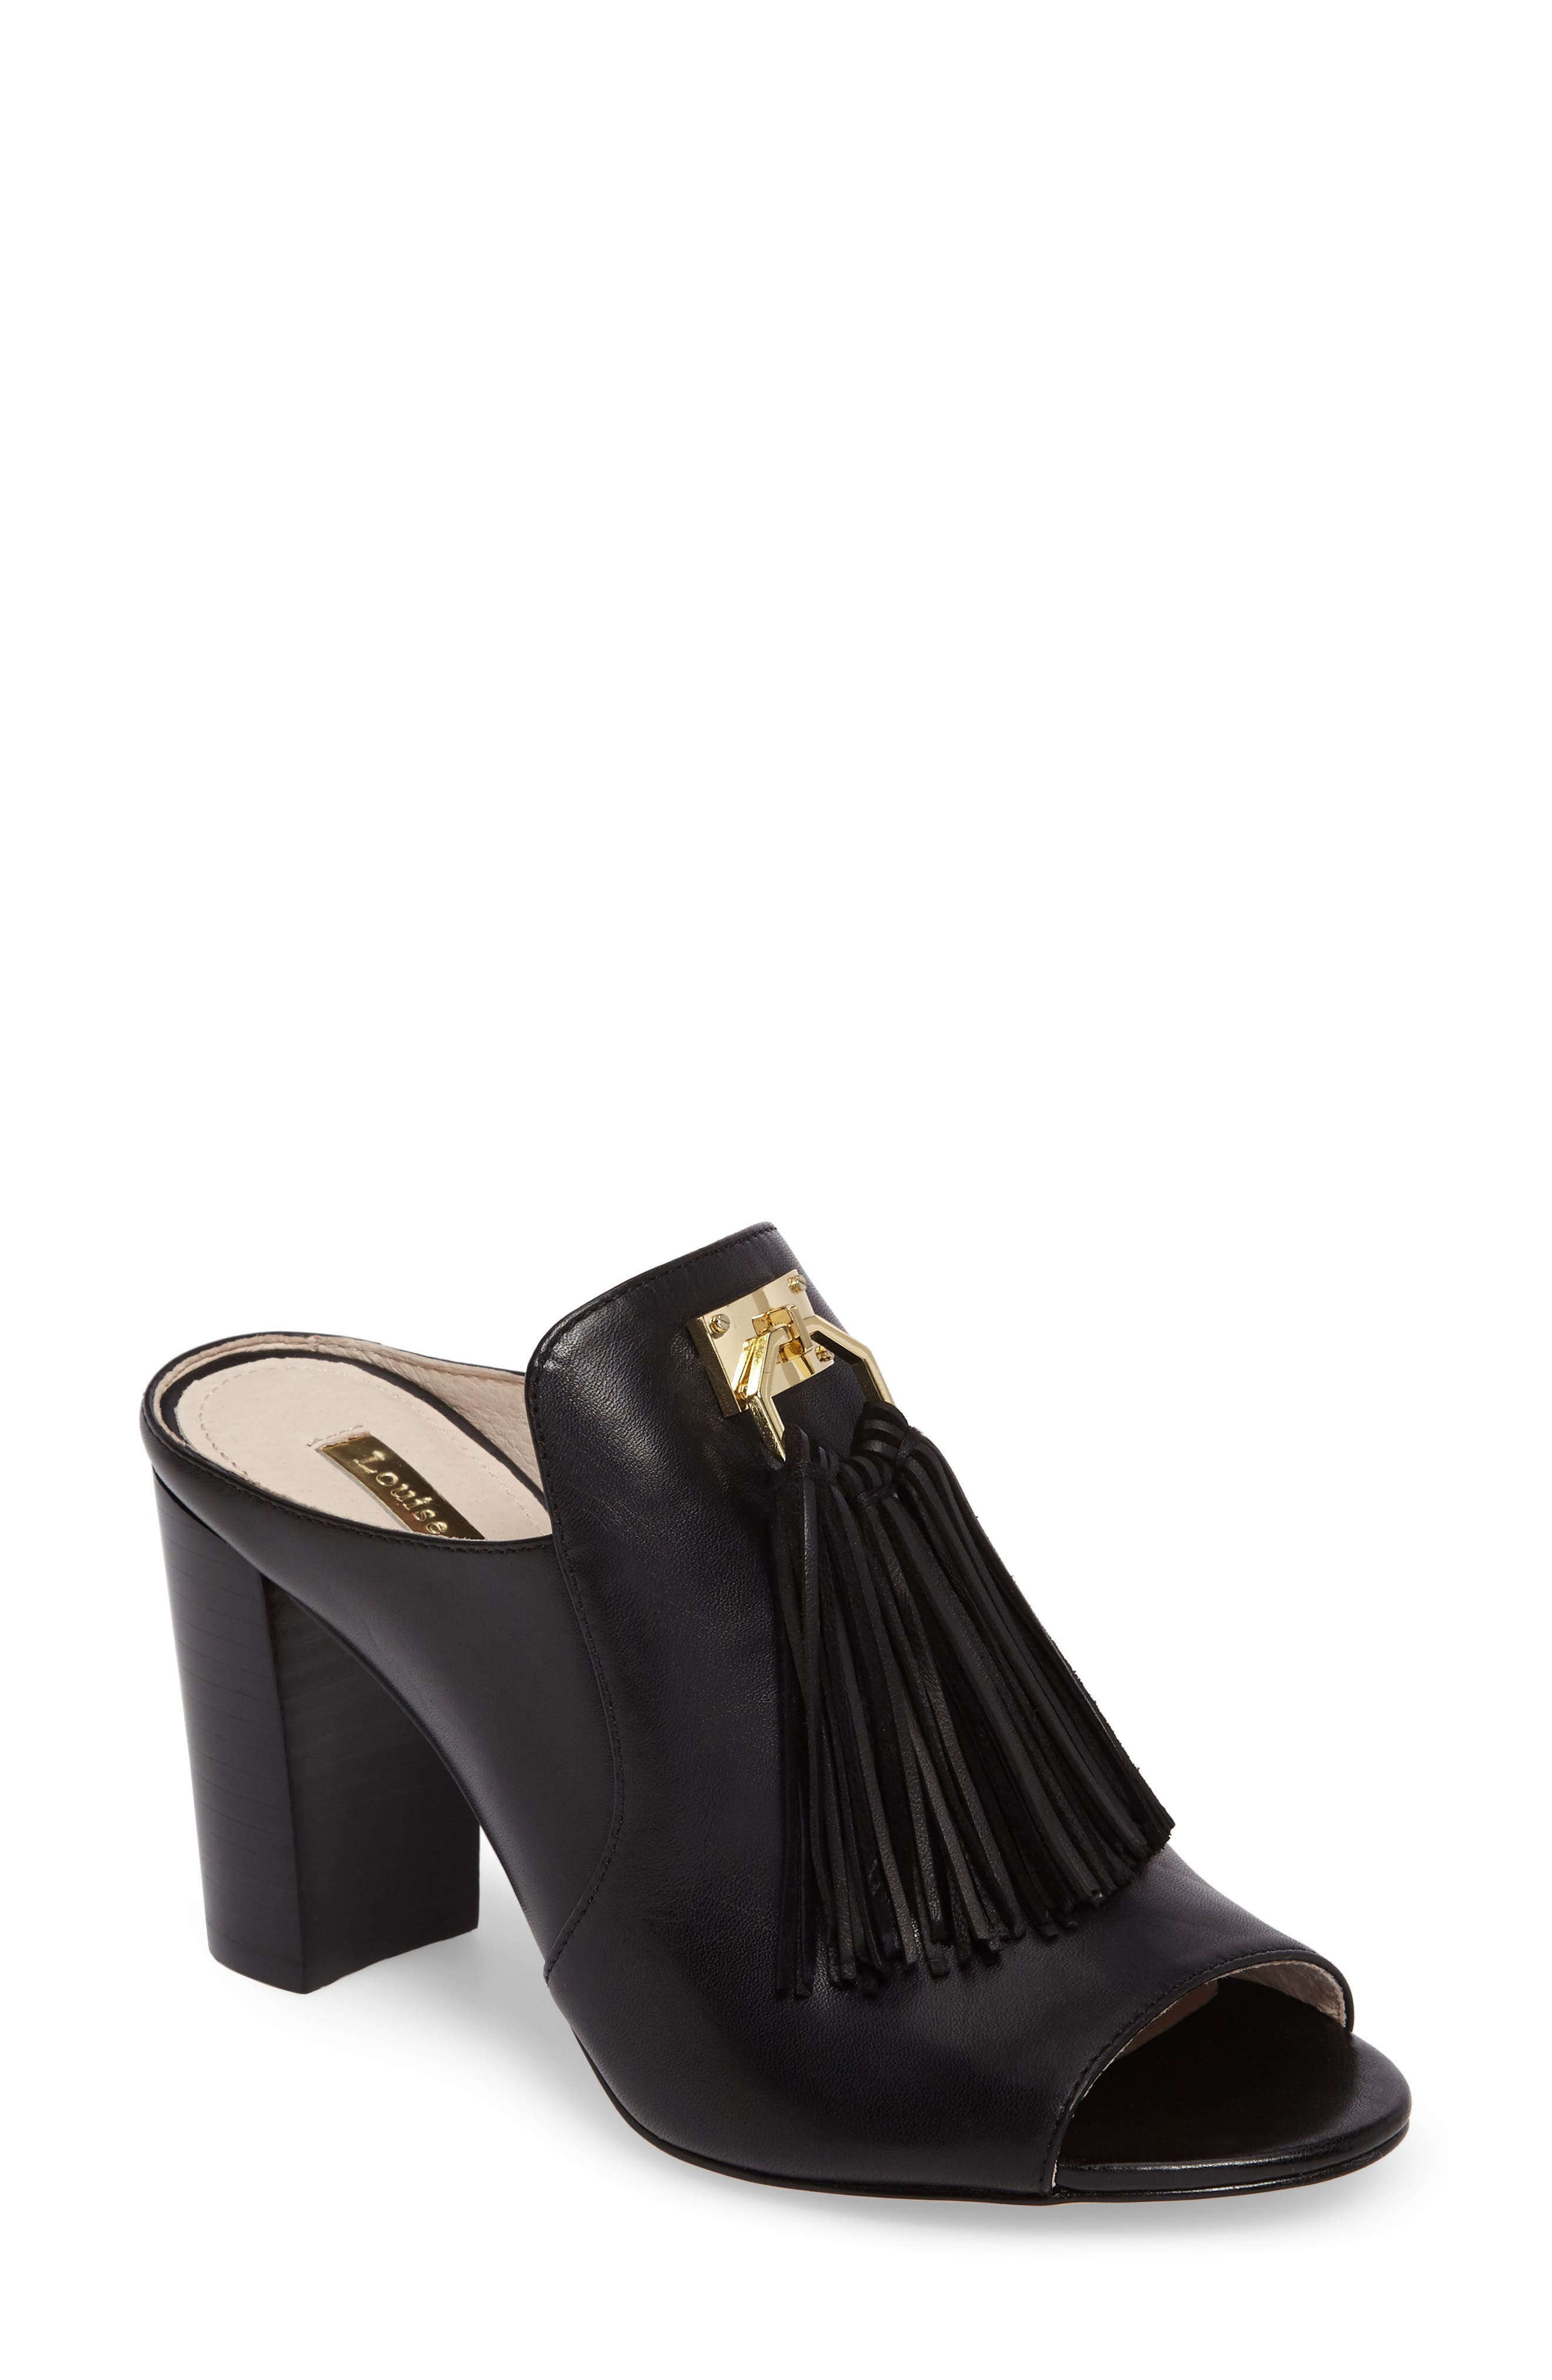 Alternate Image 1 Selected - Louise et Cie Kemi Block Heel Sandal (Women)